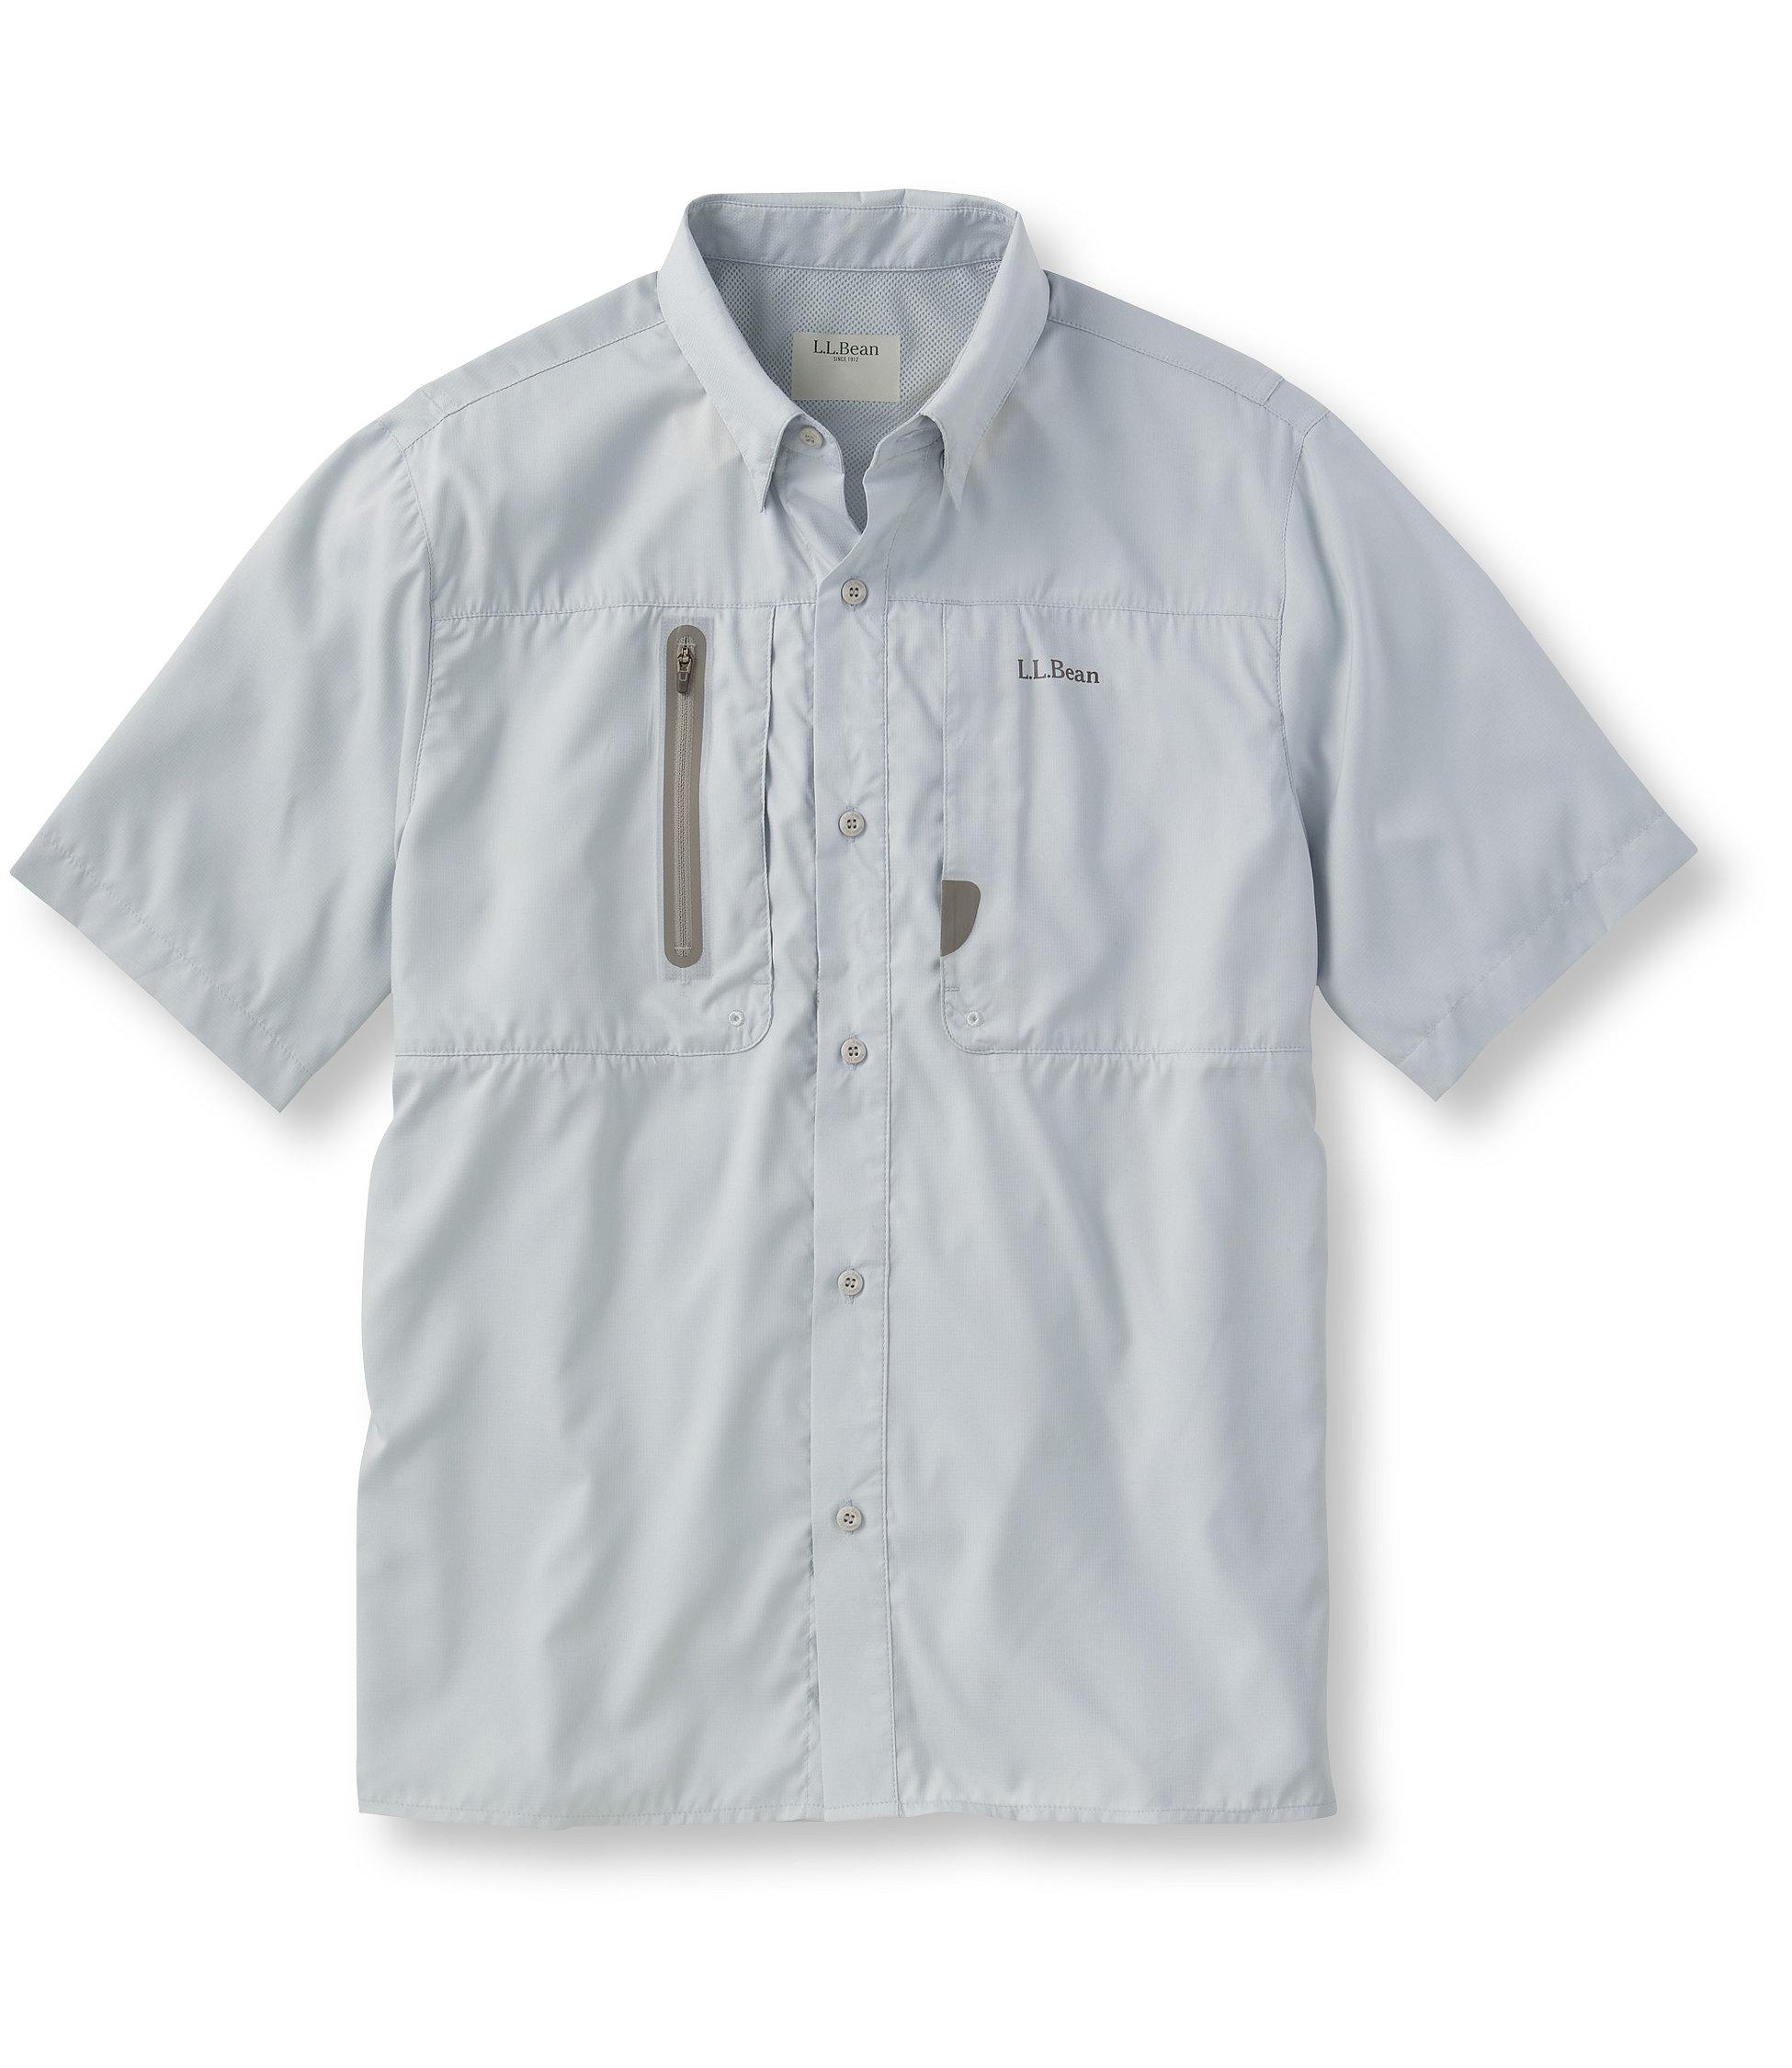 L.L.Bean Rapid River Technical Fishing Shirt, Short-Sleeve